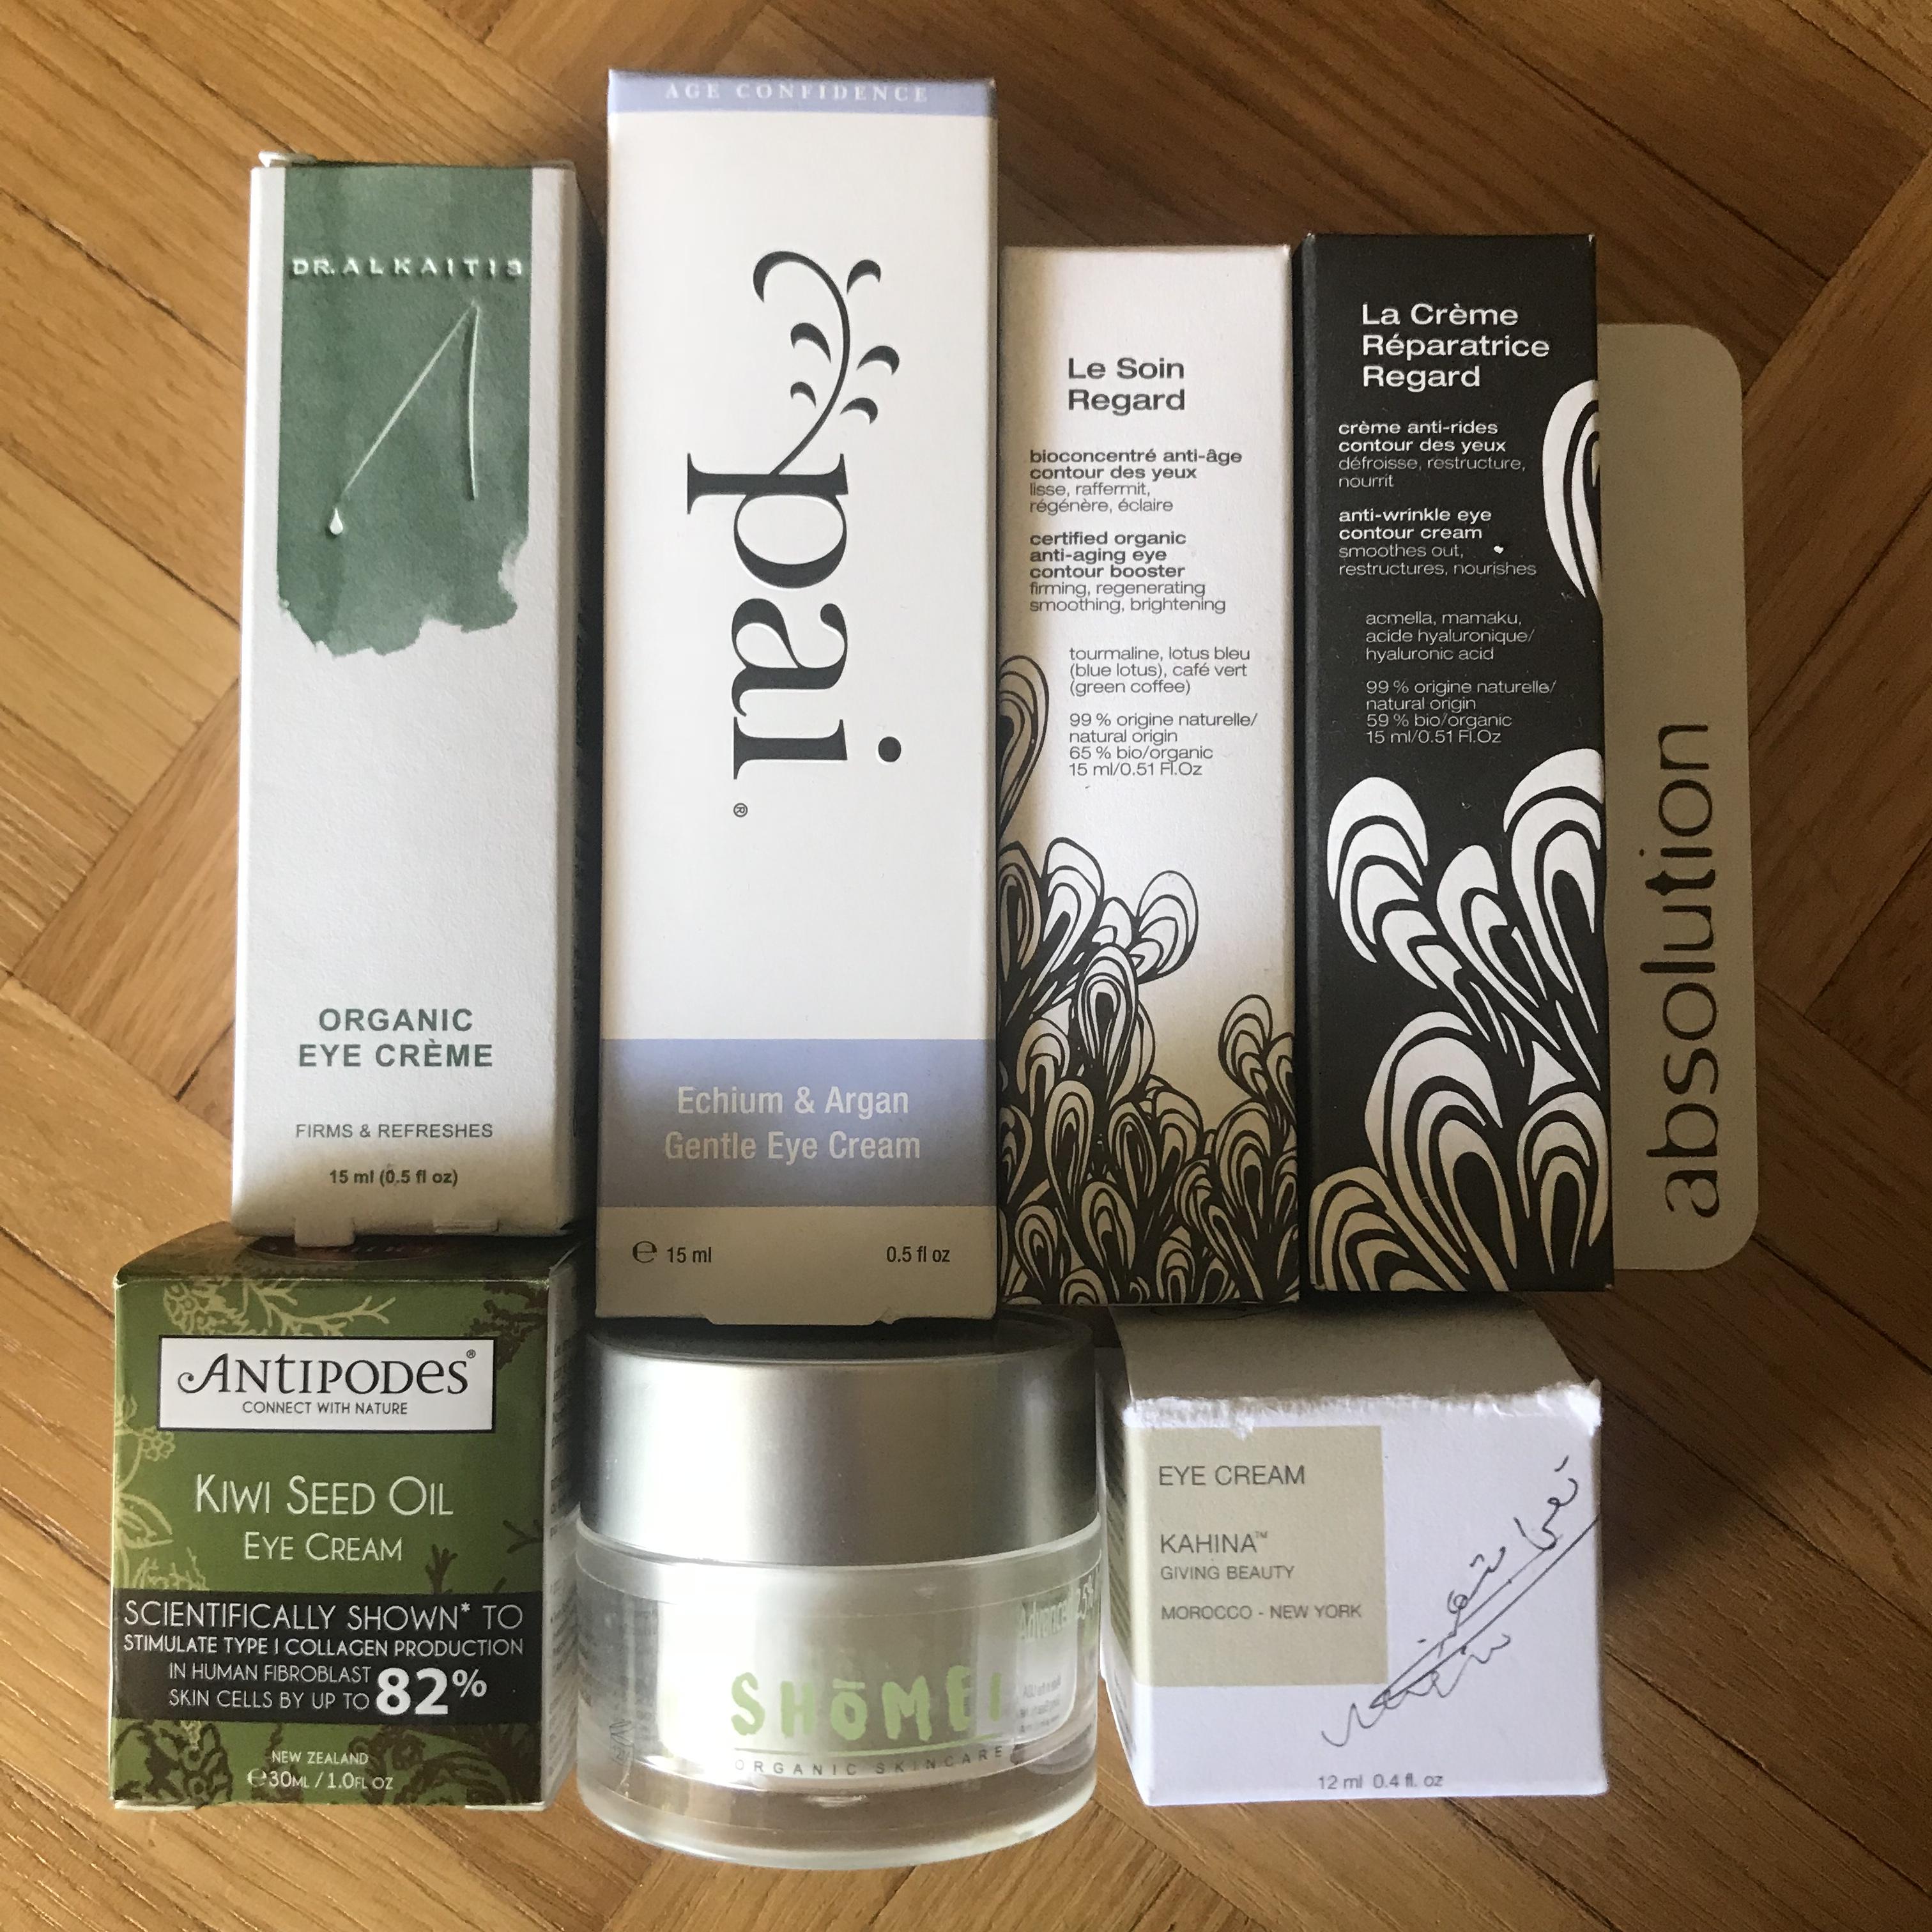 Dr Alkaitis Organic Night Cream Biobeautyboutique Naturkosmetik Pot Kosmetik 15ml Eye Catcher Widmen Wir Uns Dem Augenblick